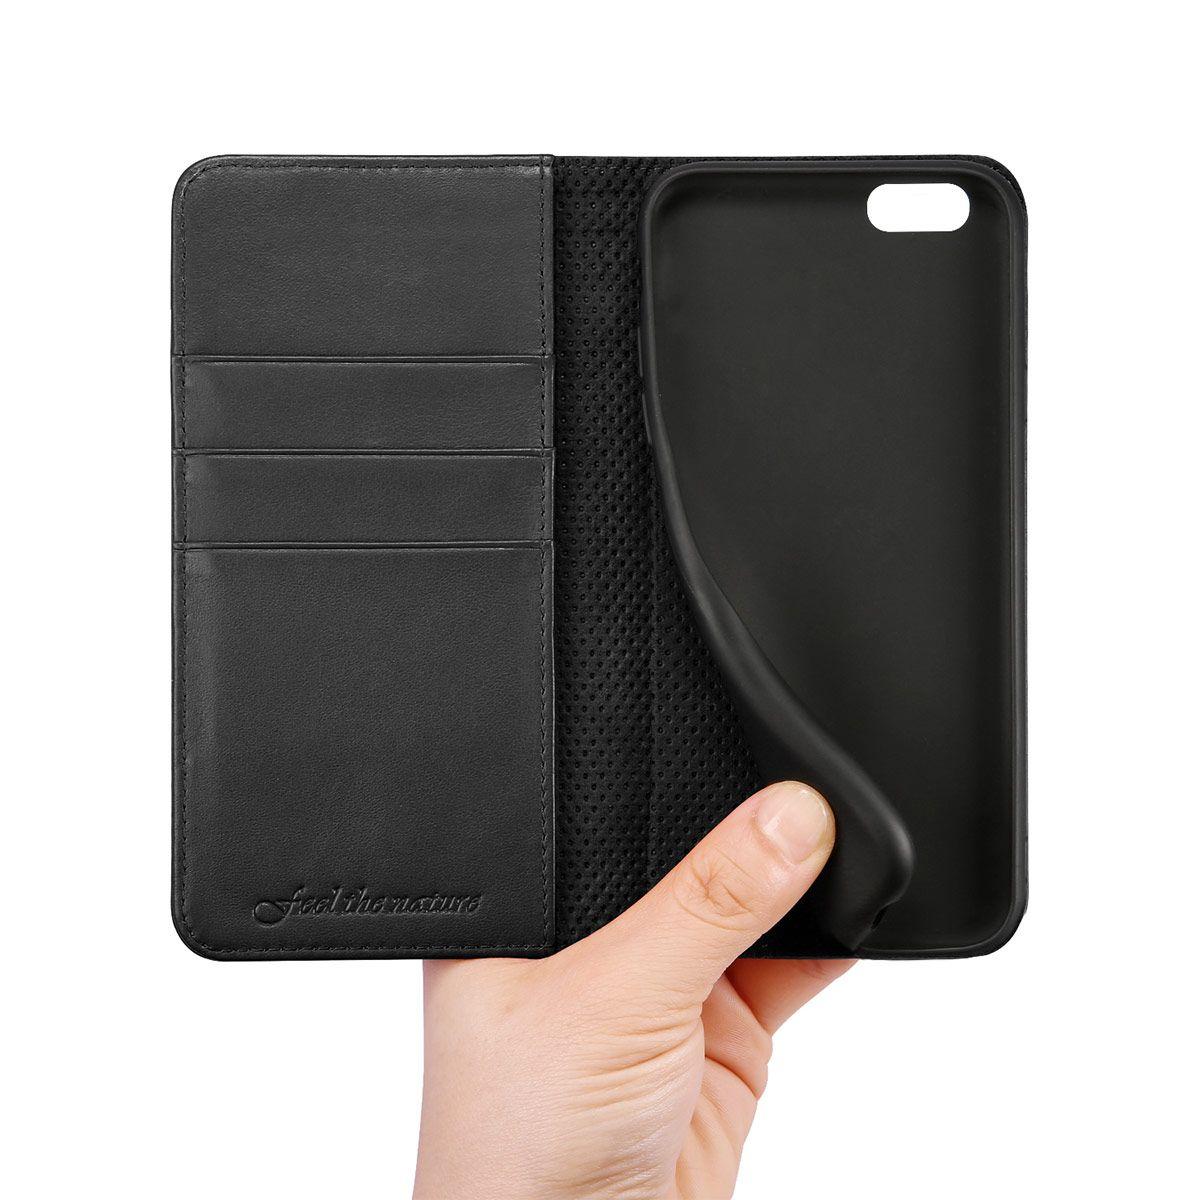 shieldon iphone 6 plus folio case genuine leather cover. Black Bedroom Furniture Sets. Home Design Ideas